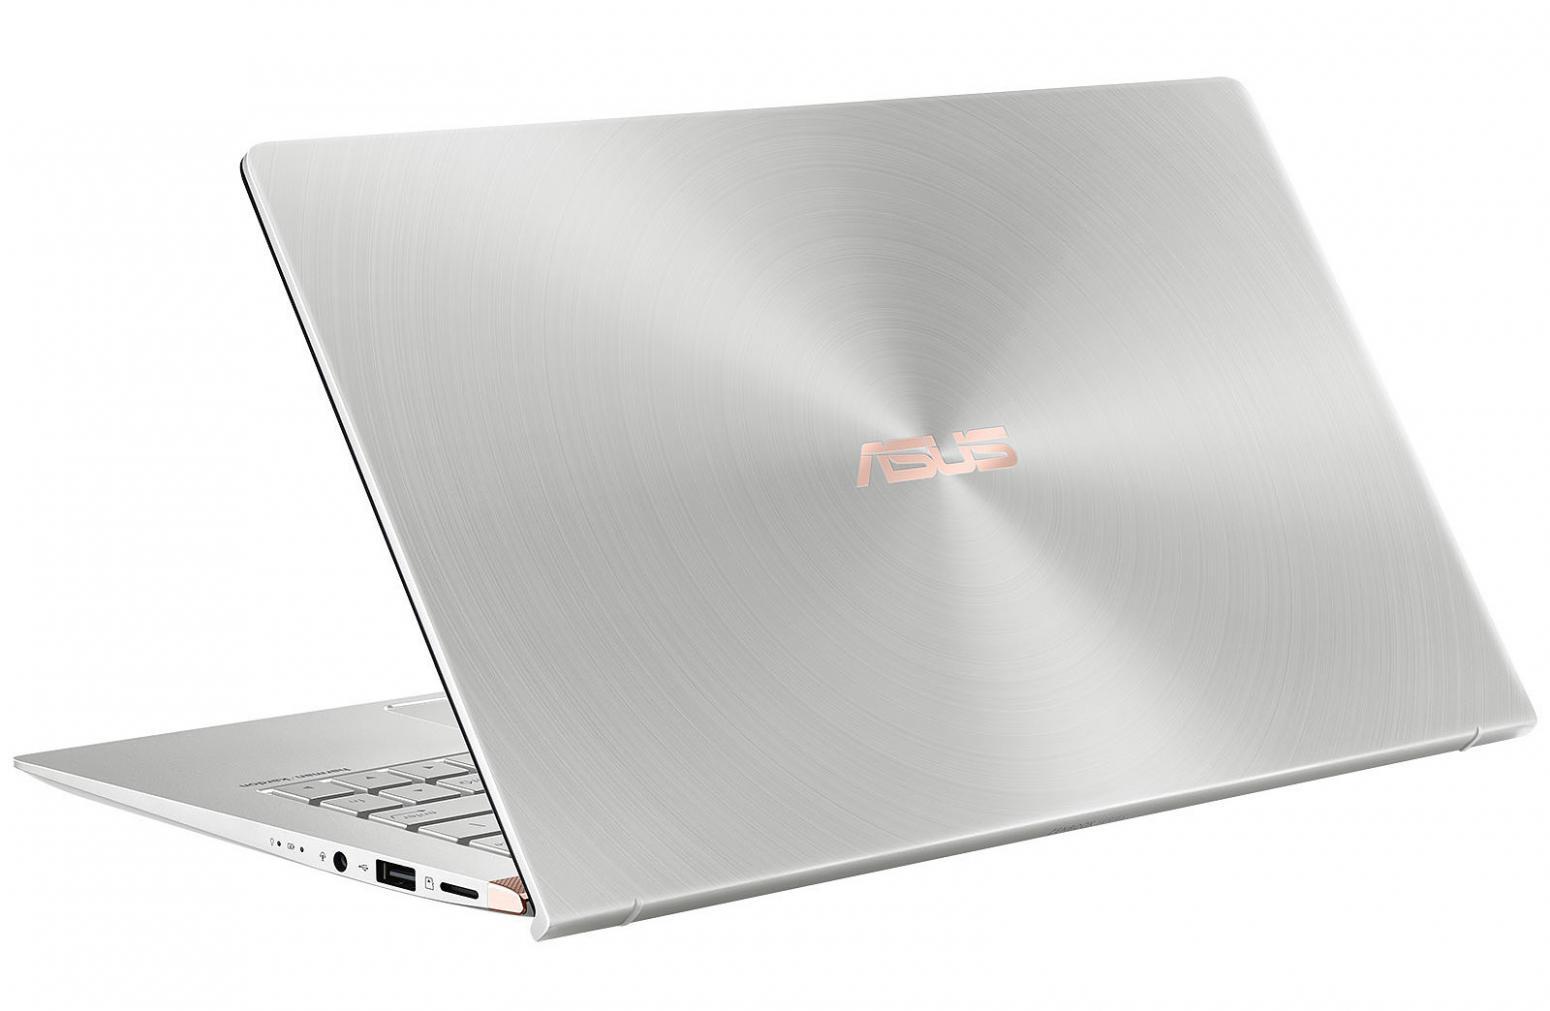 Ordinateur portable Asus Zenbook 13 UX333FA-A3112R Argent - NumPad, Pro - photo 5